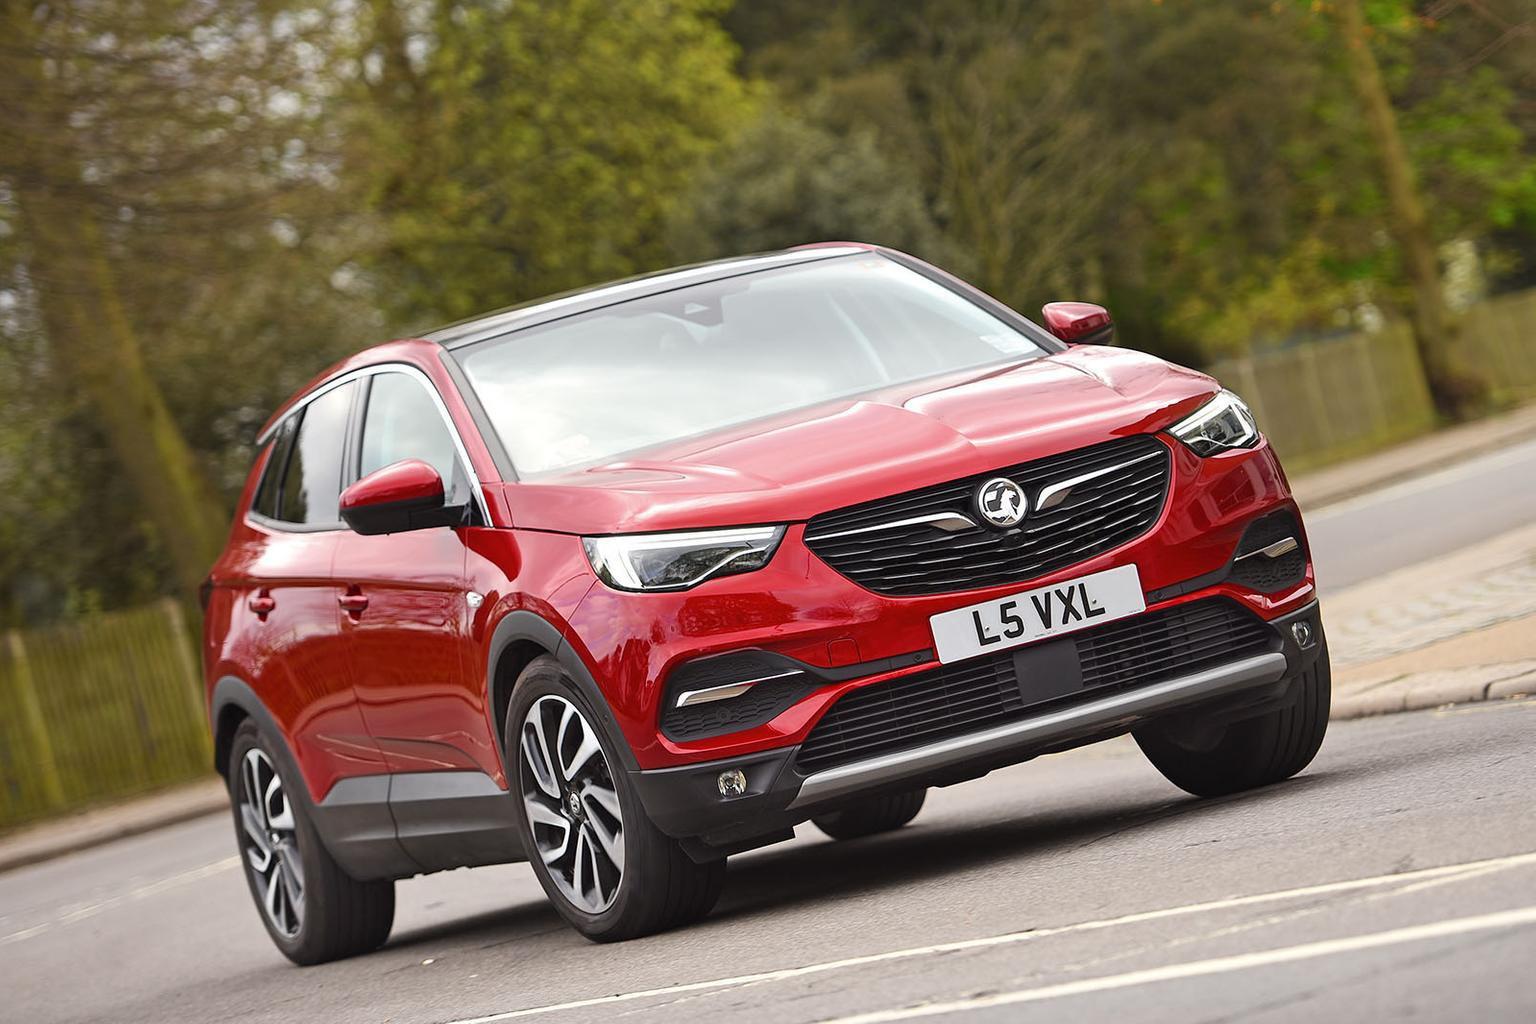 New Vauxhall Grandland X vs Renault Kadjar vs Skoda Karoq